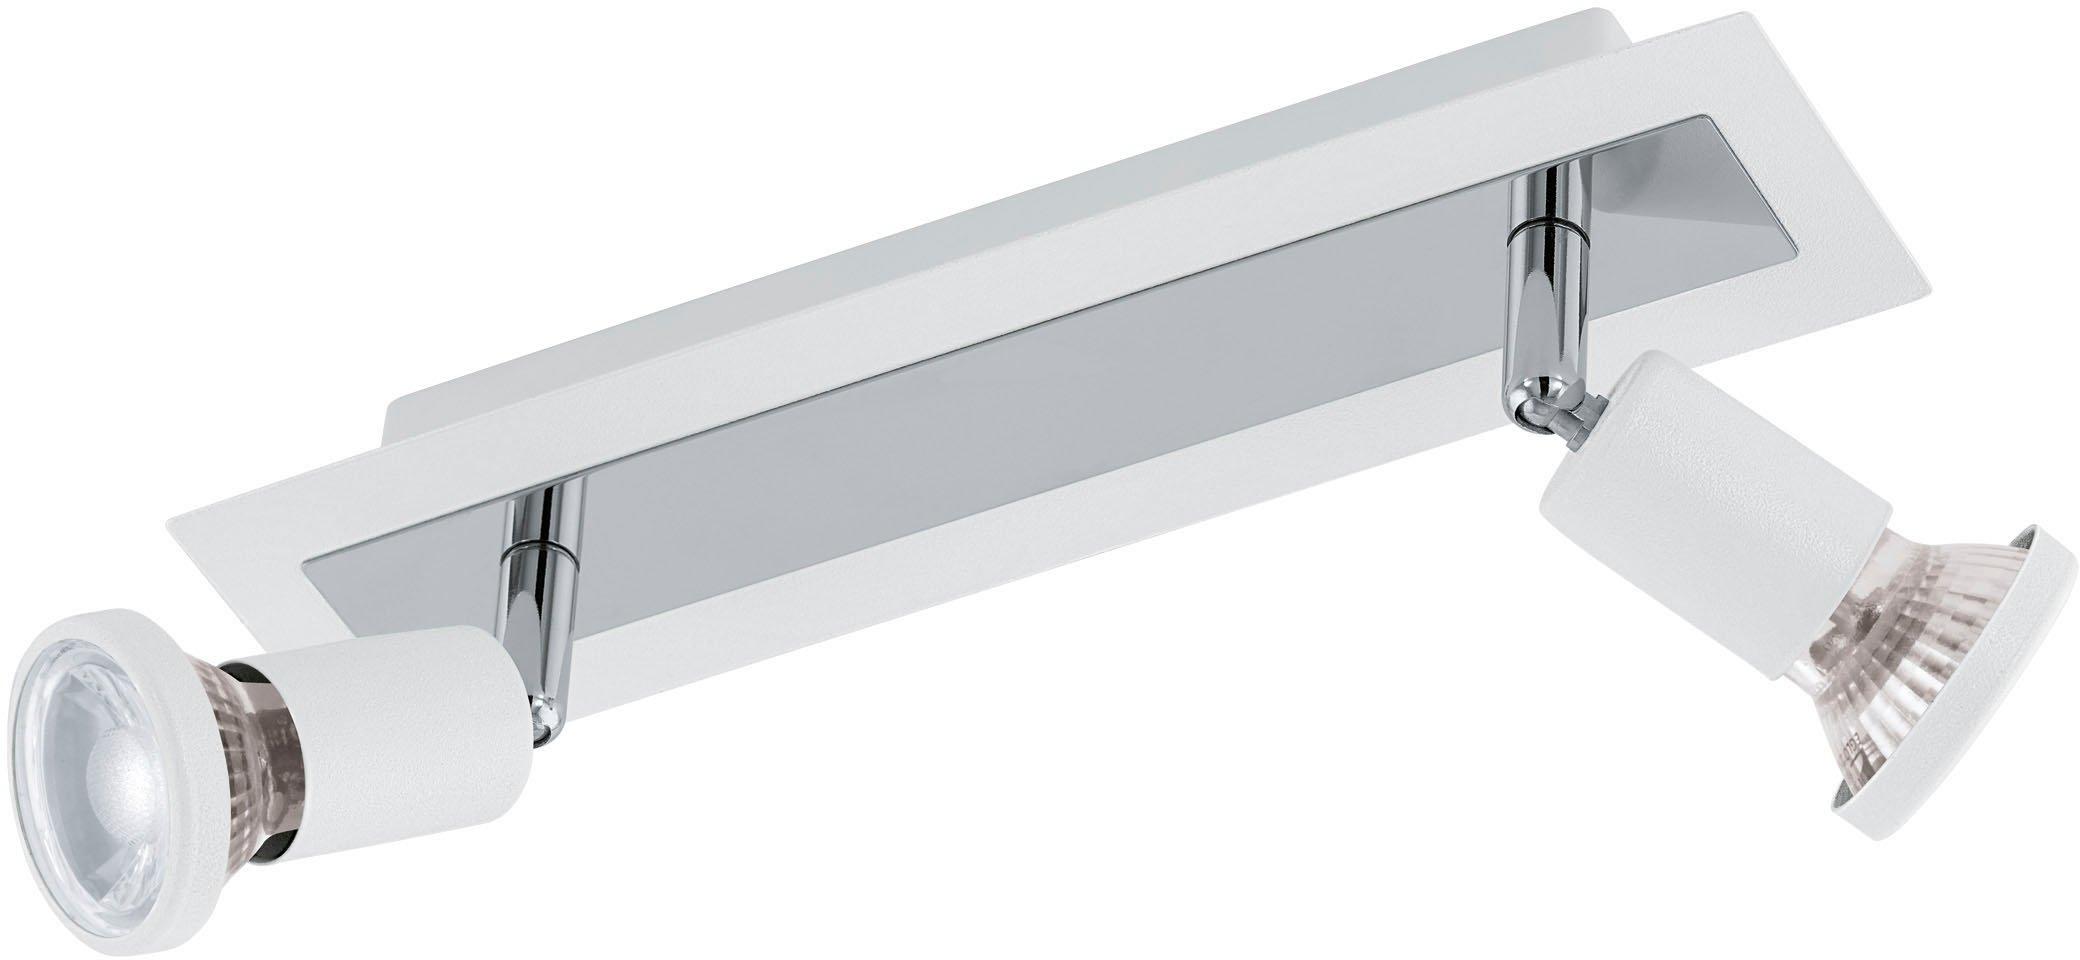 EGLO led-plafondspots SARRIA Led-plafondlamp nu online bestellen